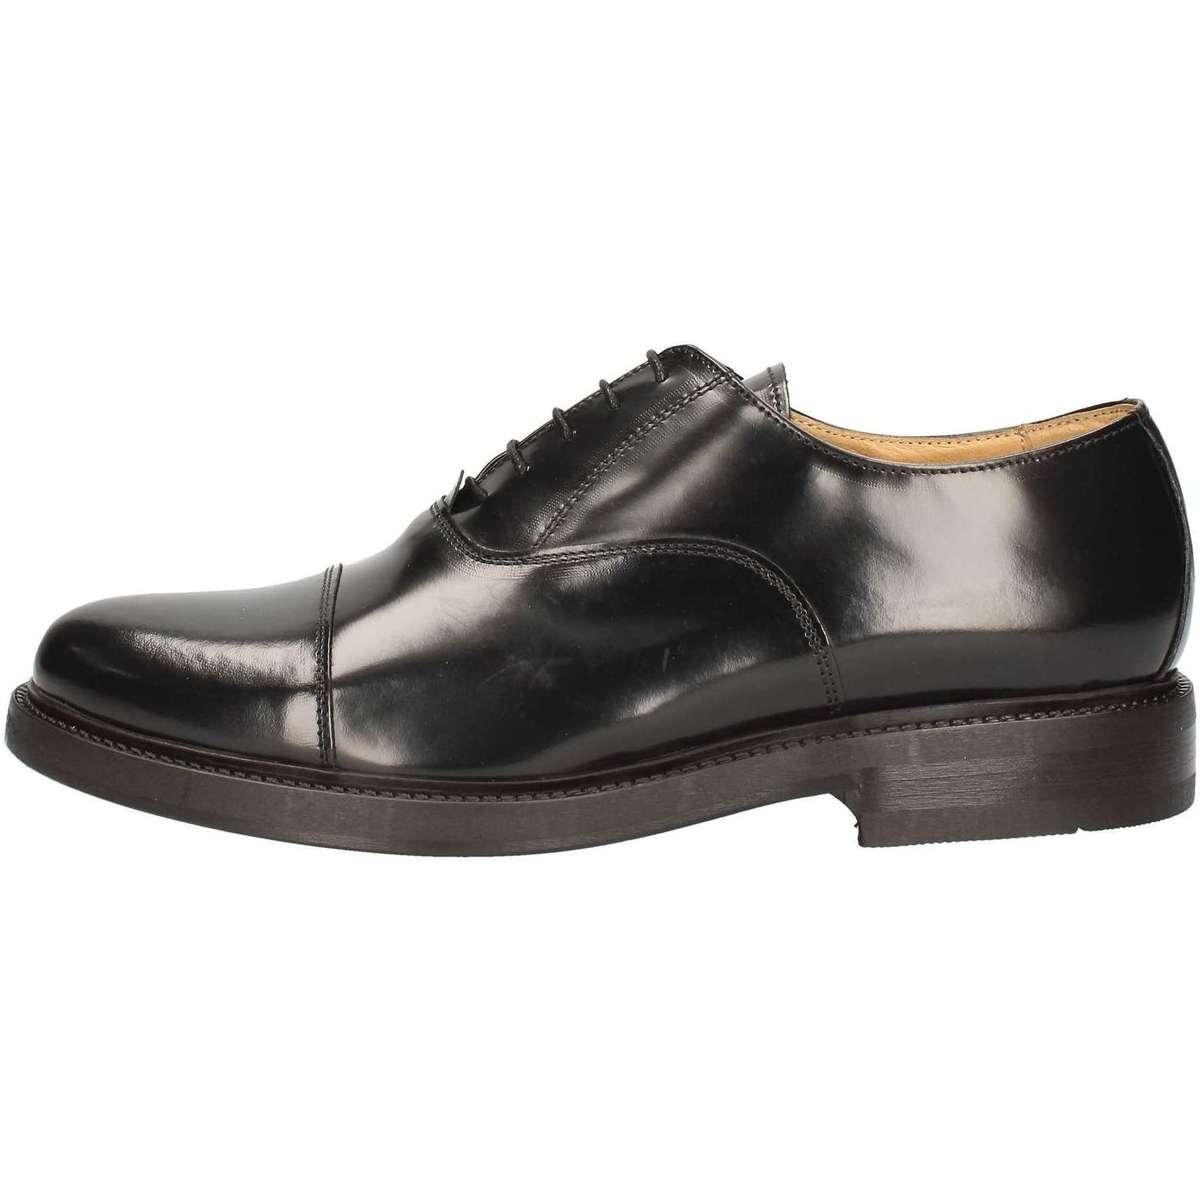 Hudson 904 Lace up shoes Mann Schwarz Schwarz - Schuhe Sneaker High Herren 92,20 €